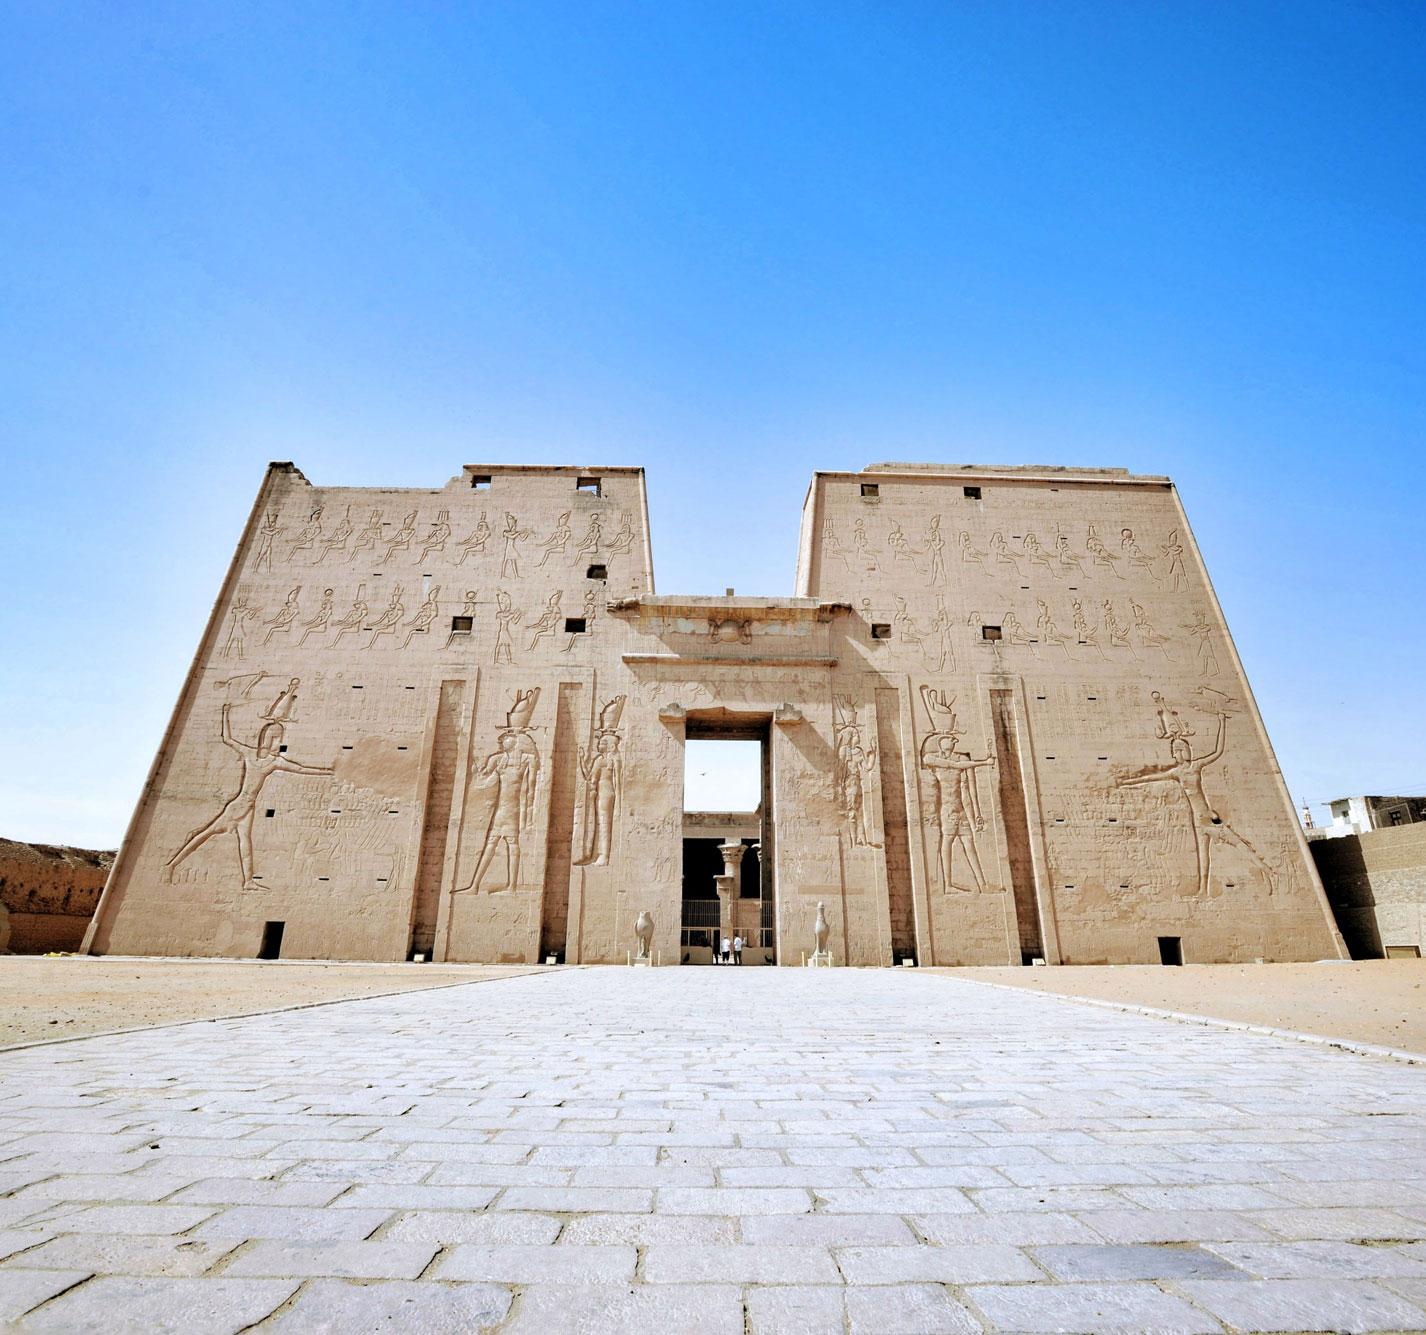 Entrance to the Temple of Horus at Edfu, Egypt